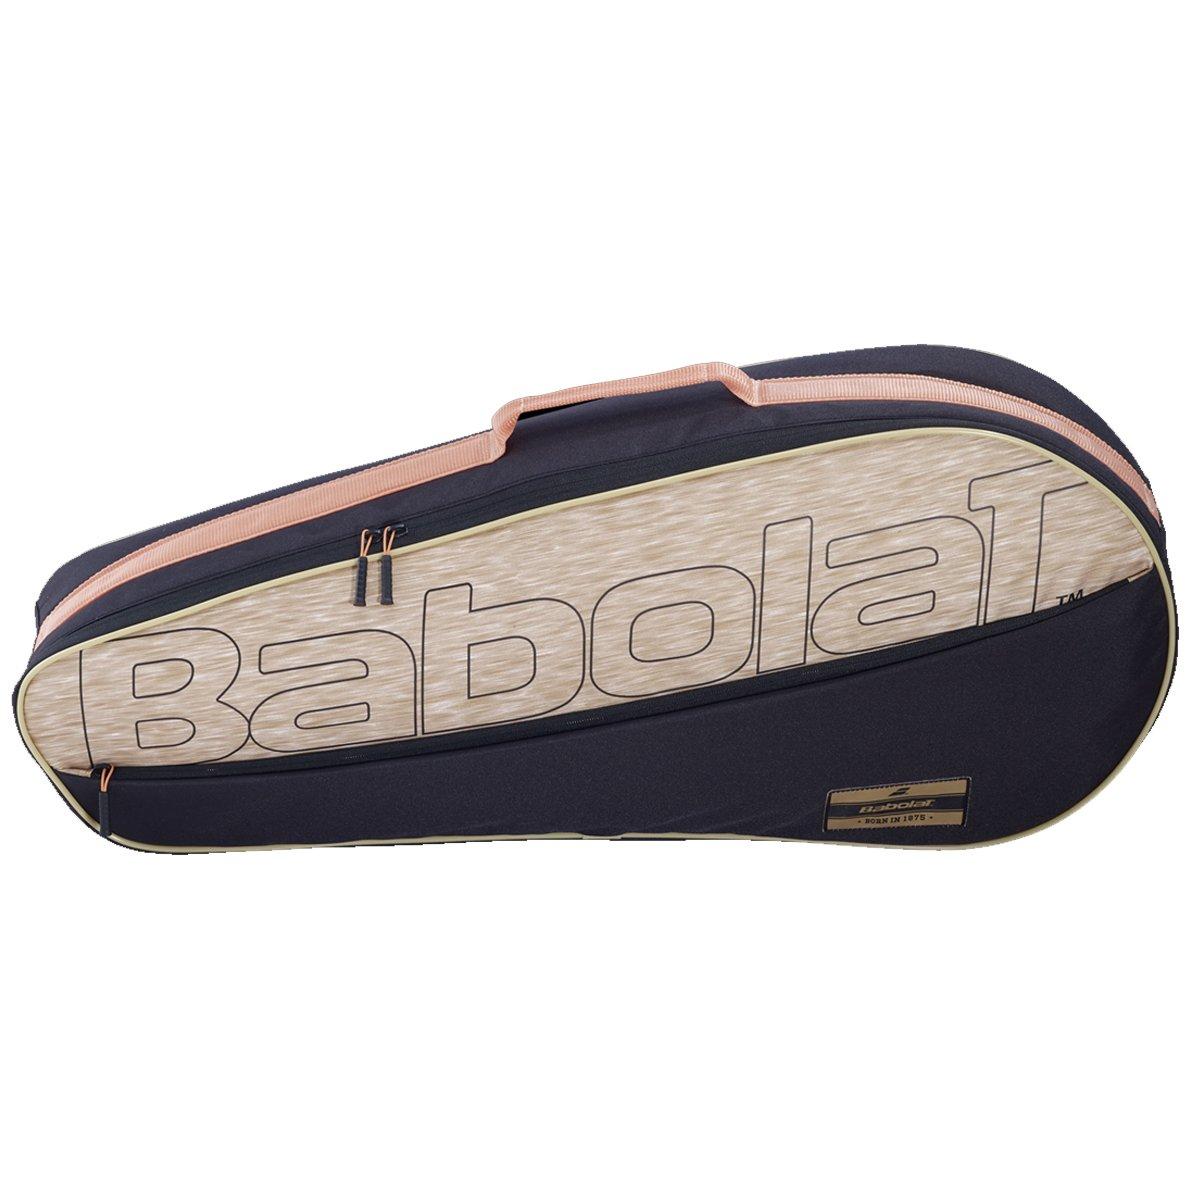 Raqueteira Babolat Essential 3R Preto e Bege - 2021  - PROTENISTA